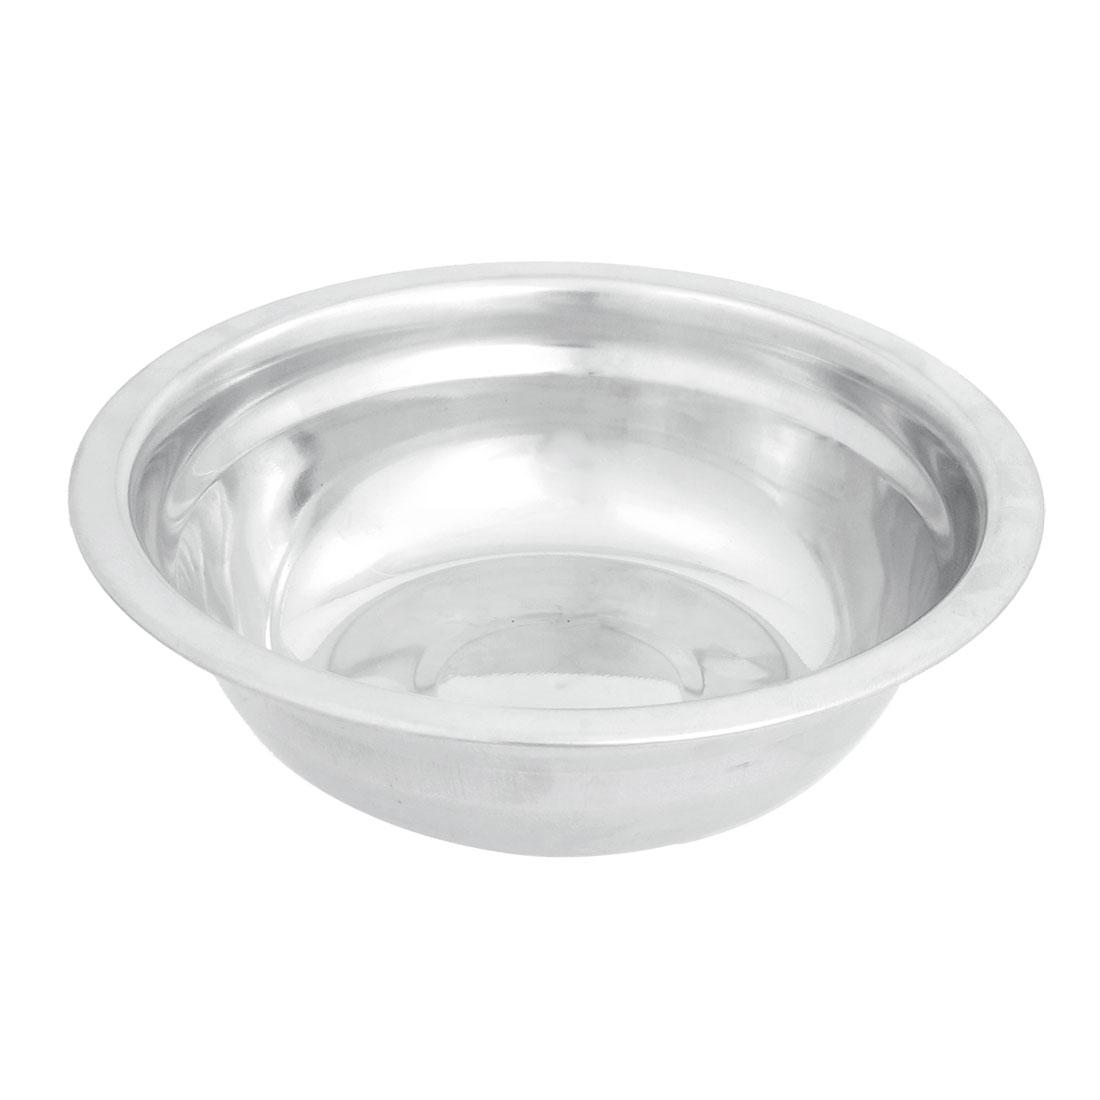 "Kitchen 5.9"" Diameter Stainless Steel Dinner Bowl Silver Tone"